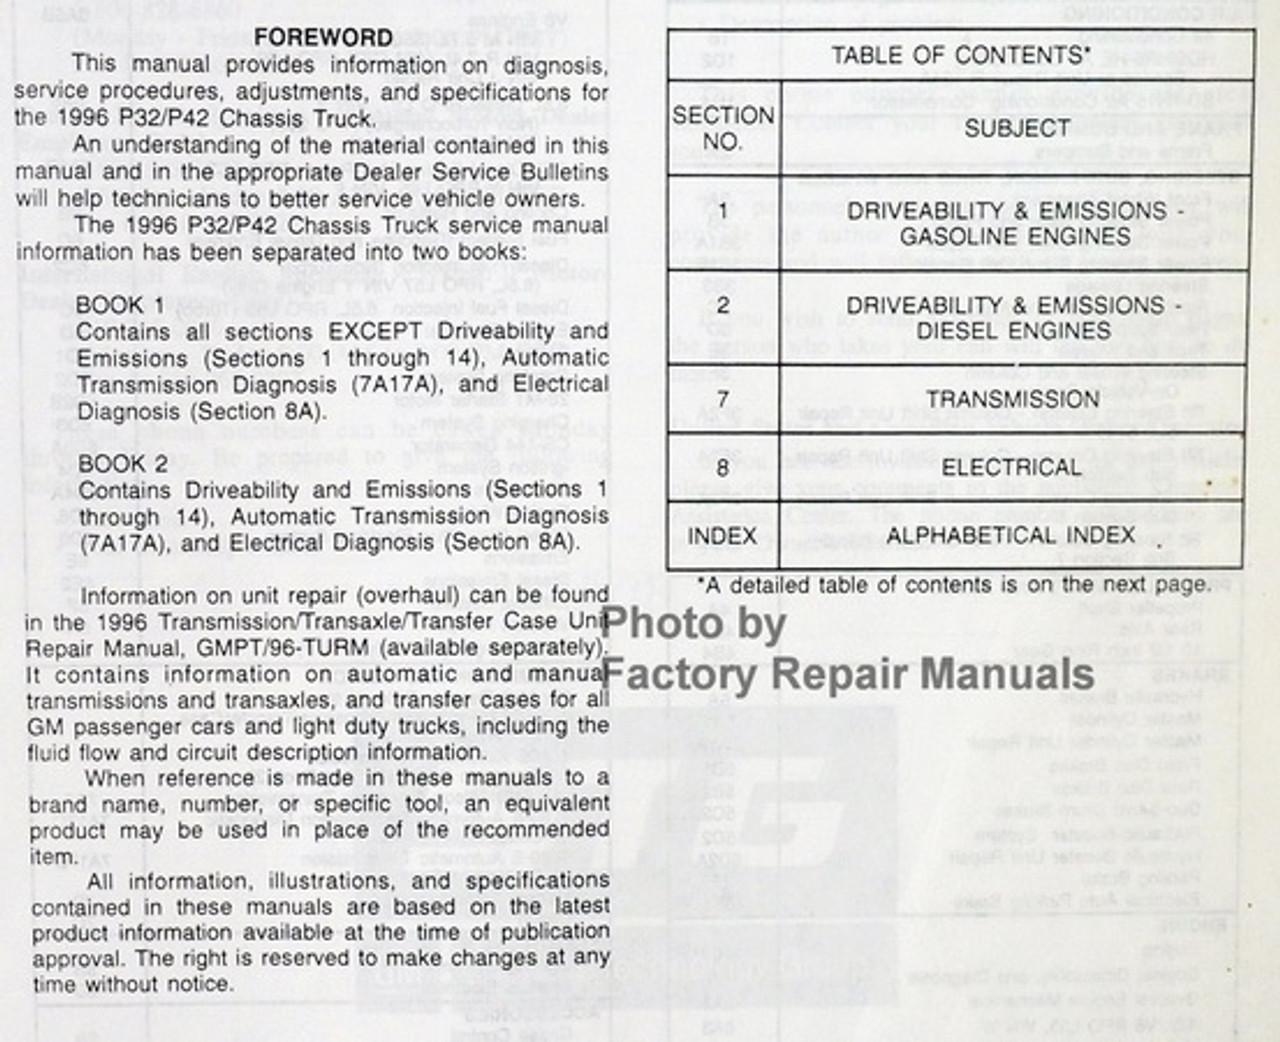 1996 Gmc Chevy P32 P42 P3 Motorhome Chassis Factory Service Repair Manual Set